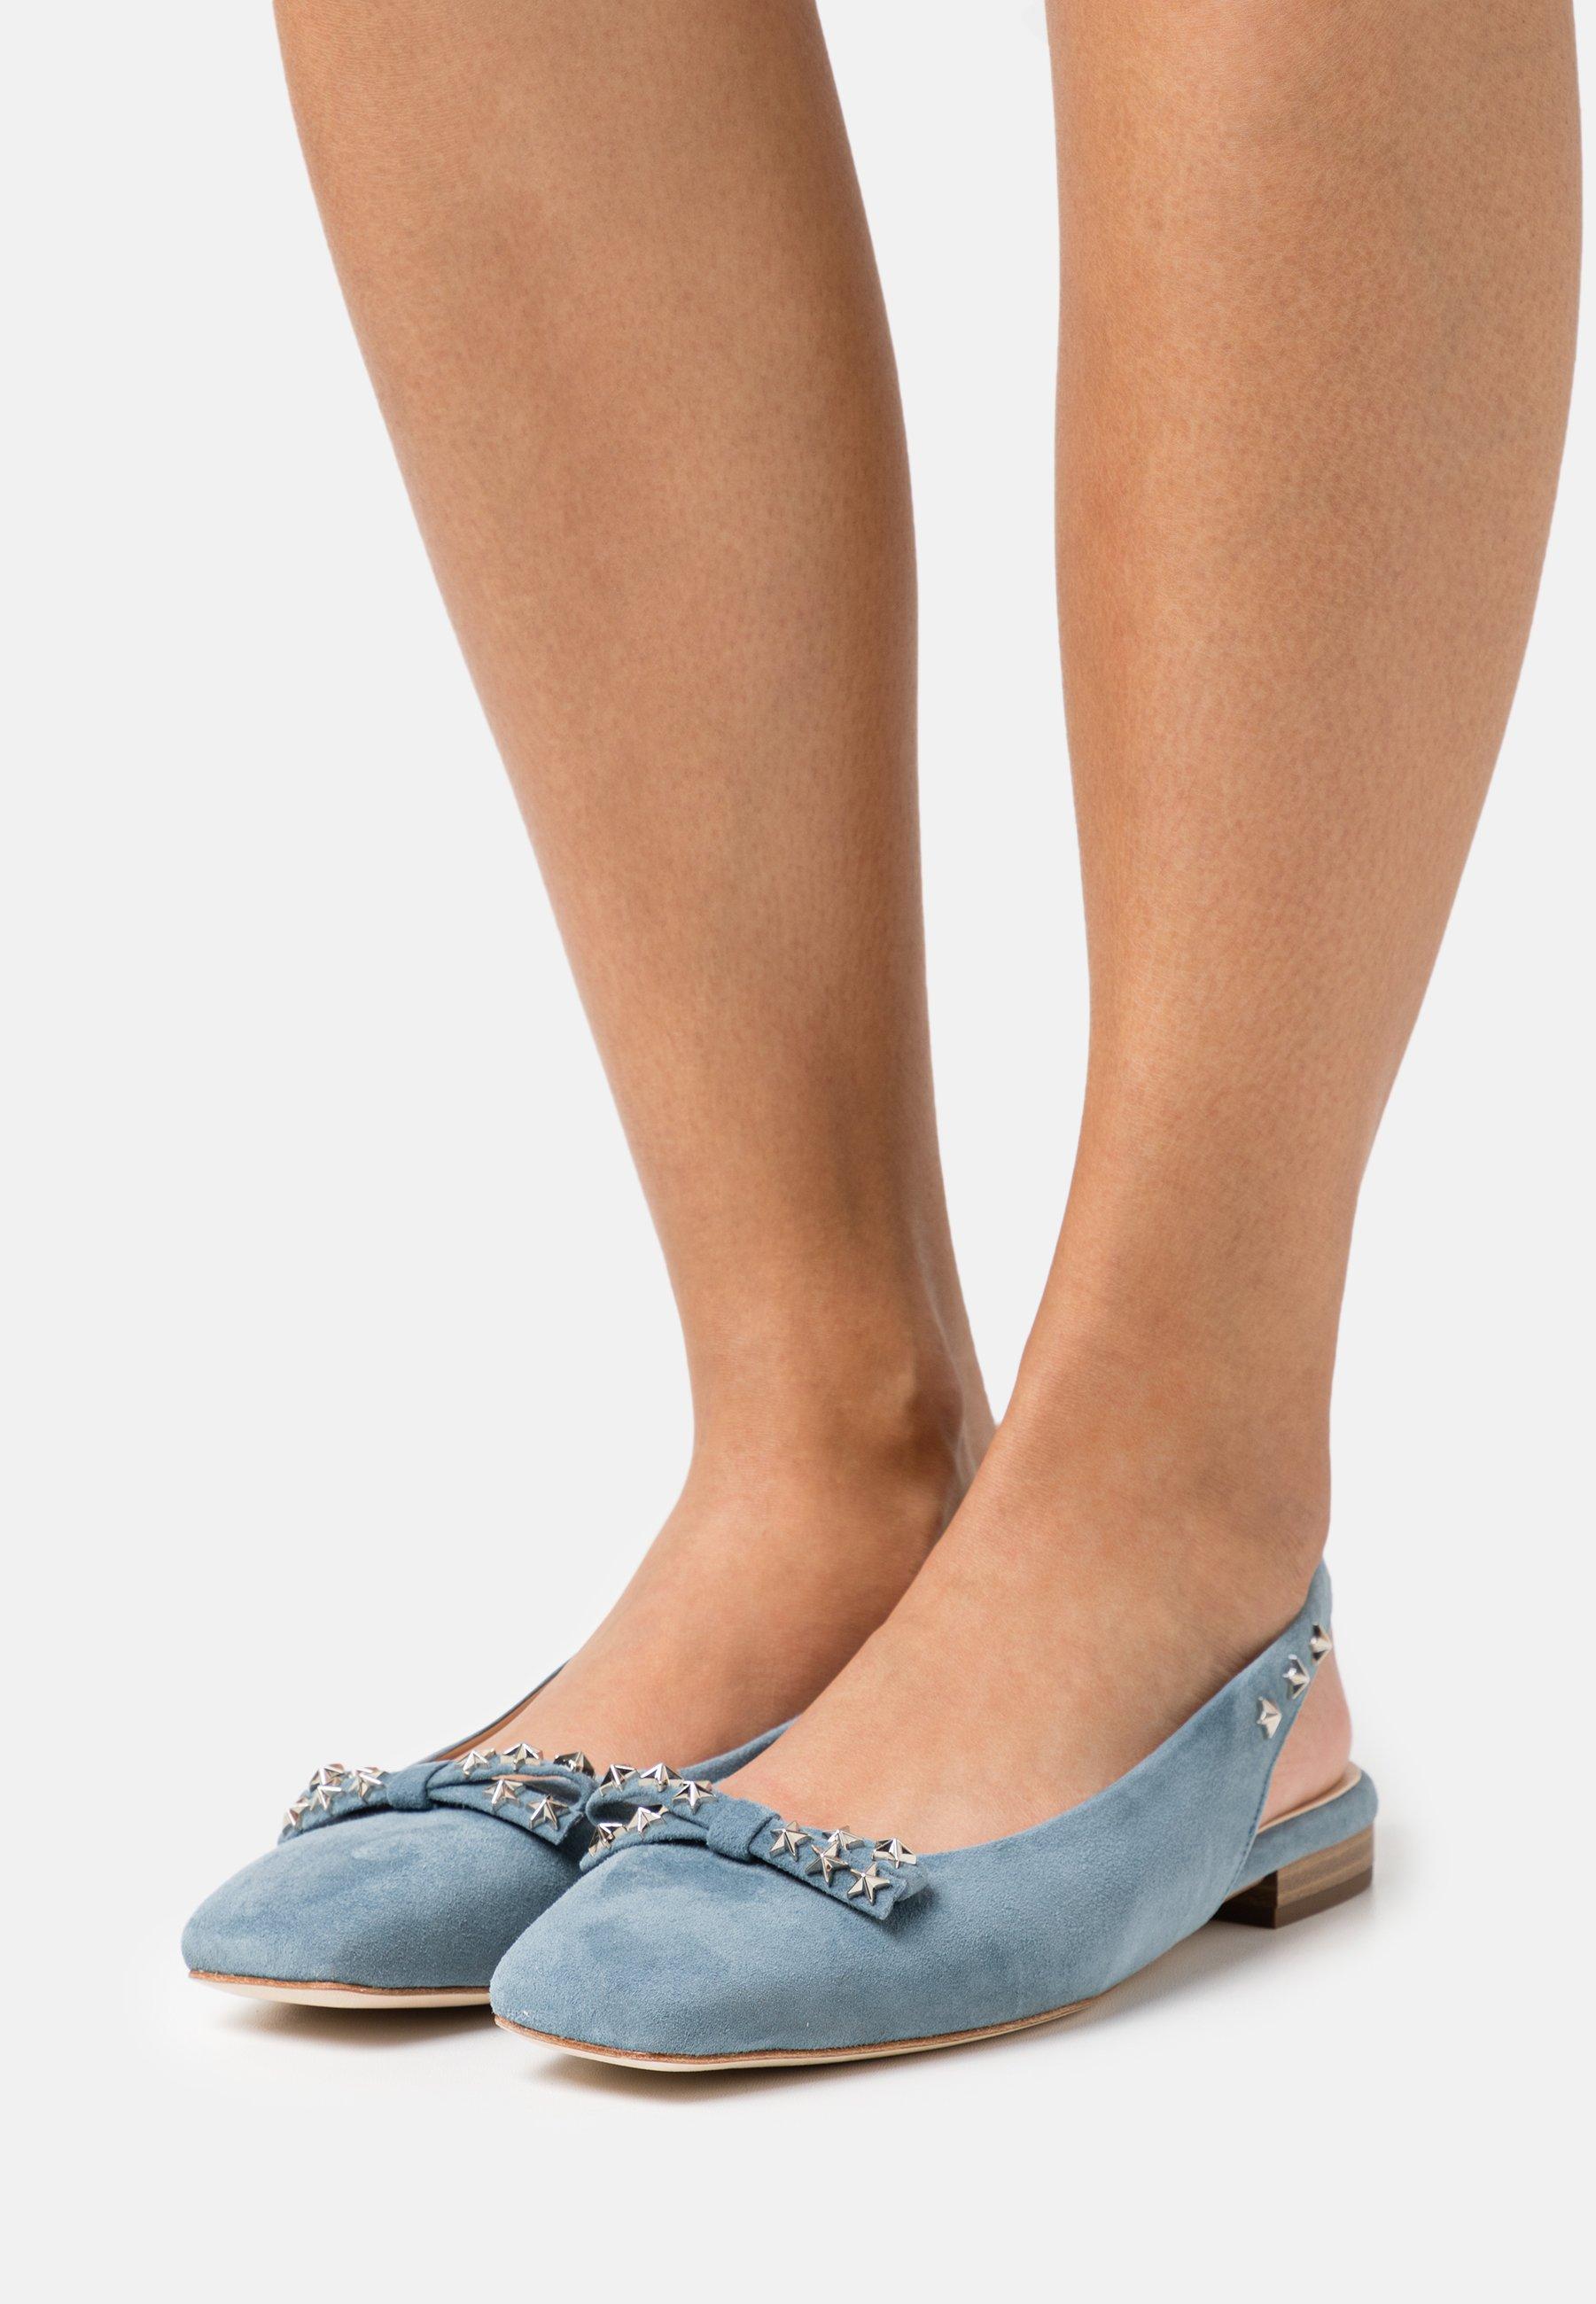 Women KÖRFEZ - Slingback ballet pumps